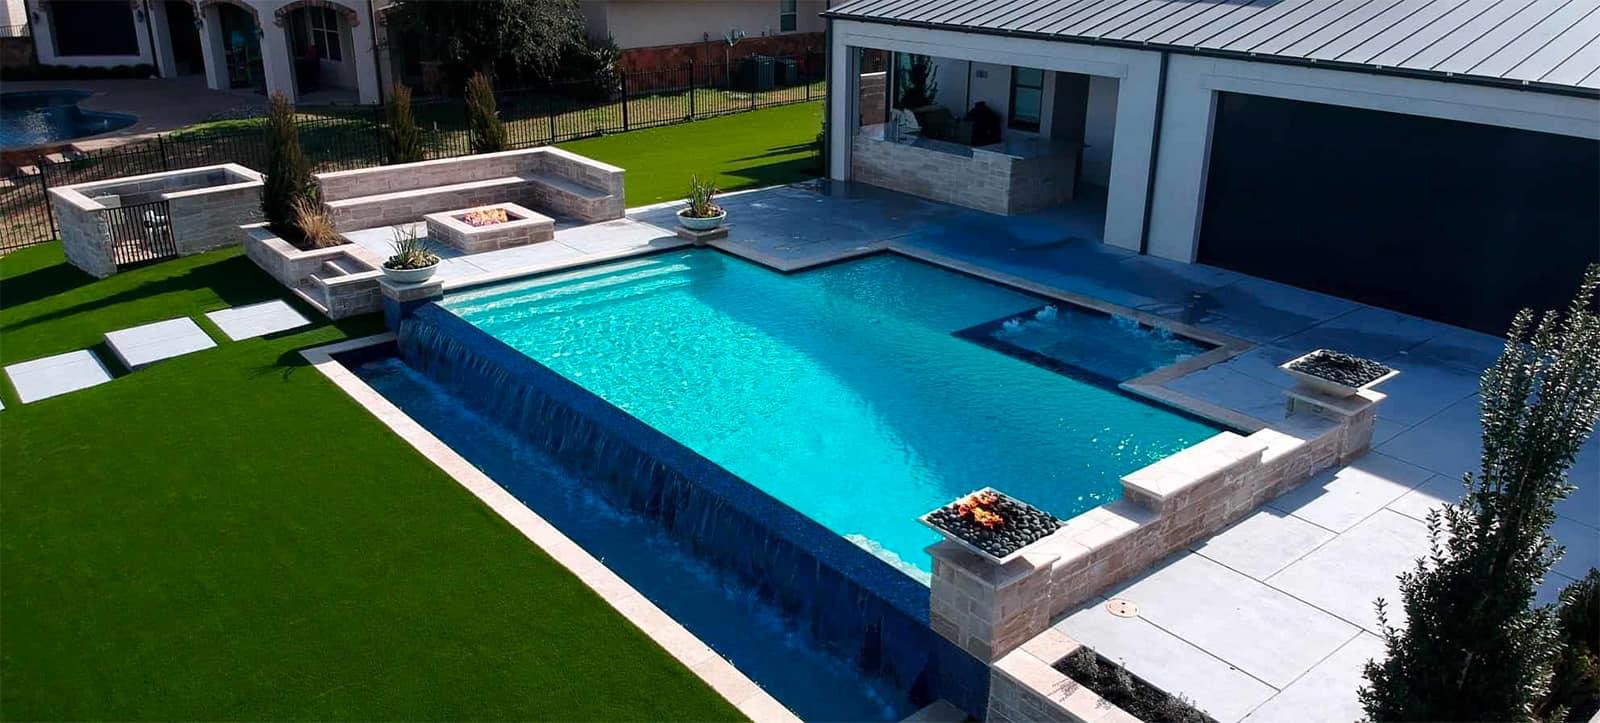 Emerald Custom Pools | Building Backyard Pools in Dallas ...